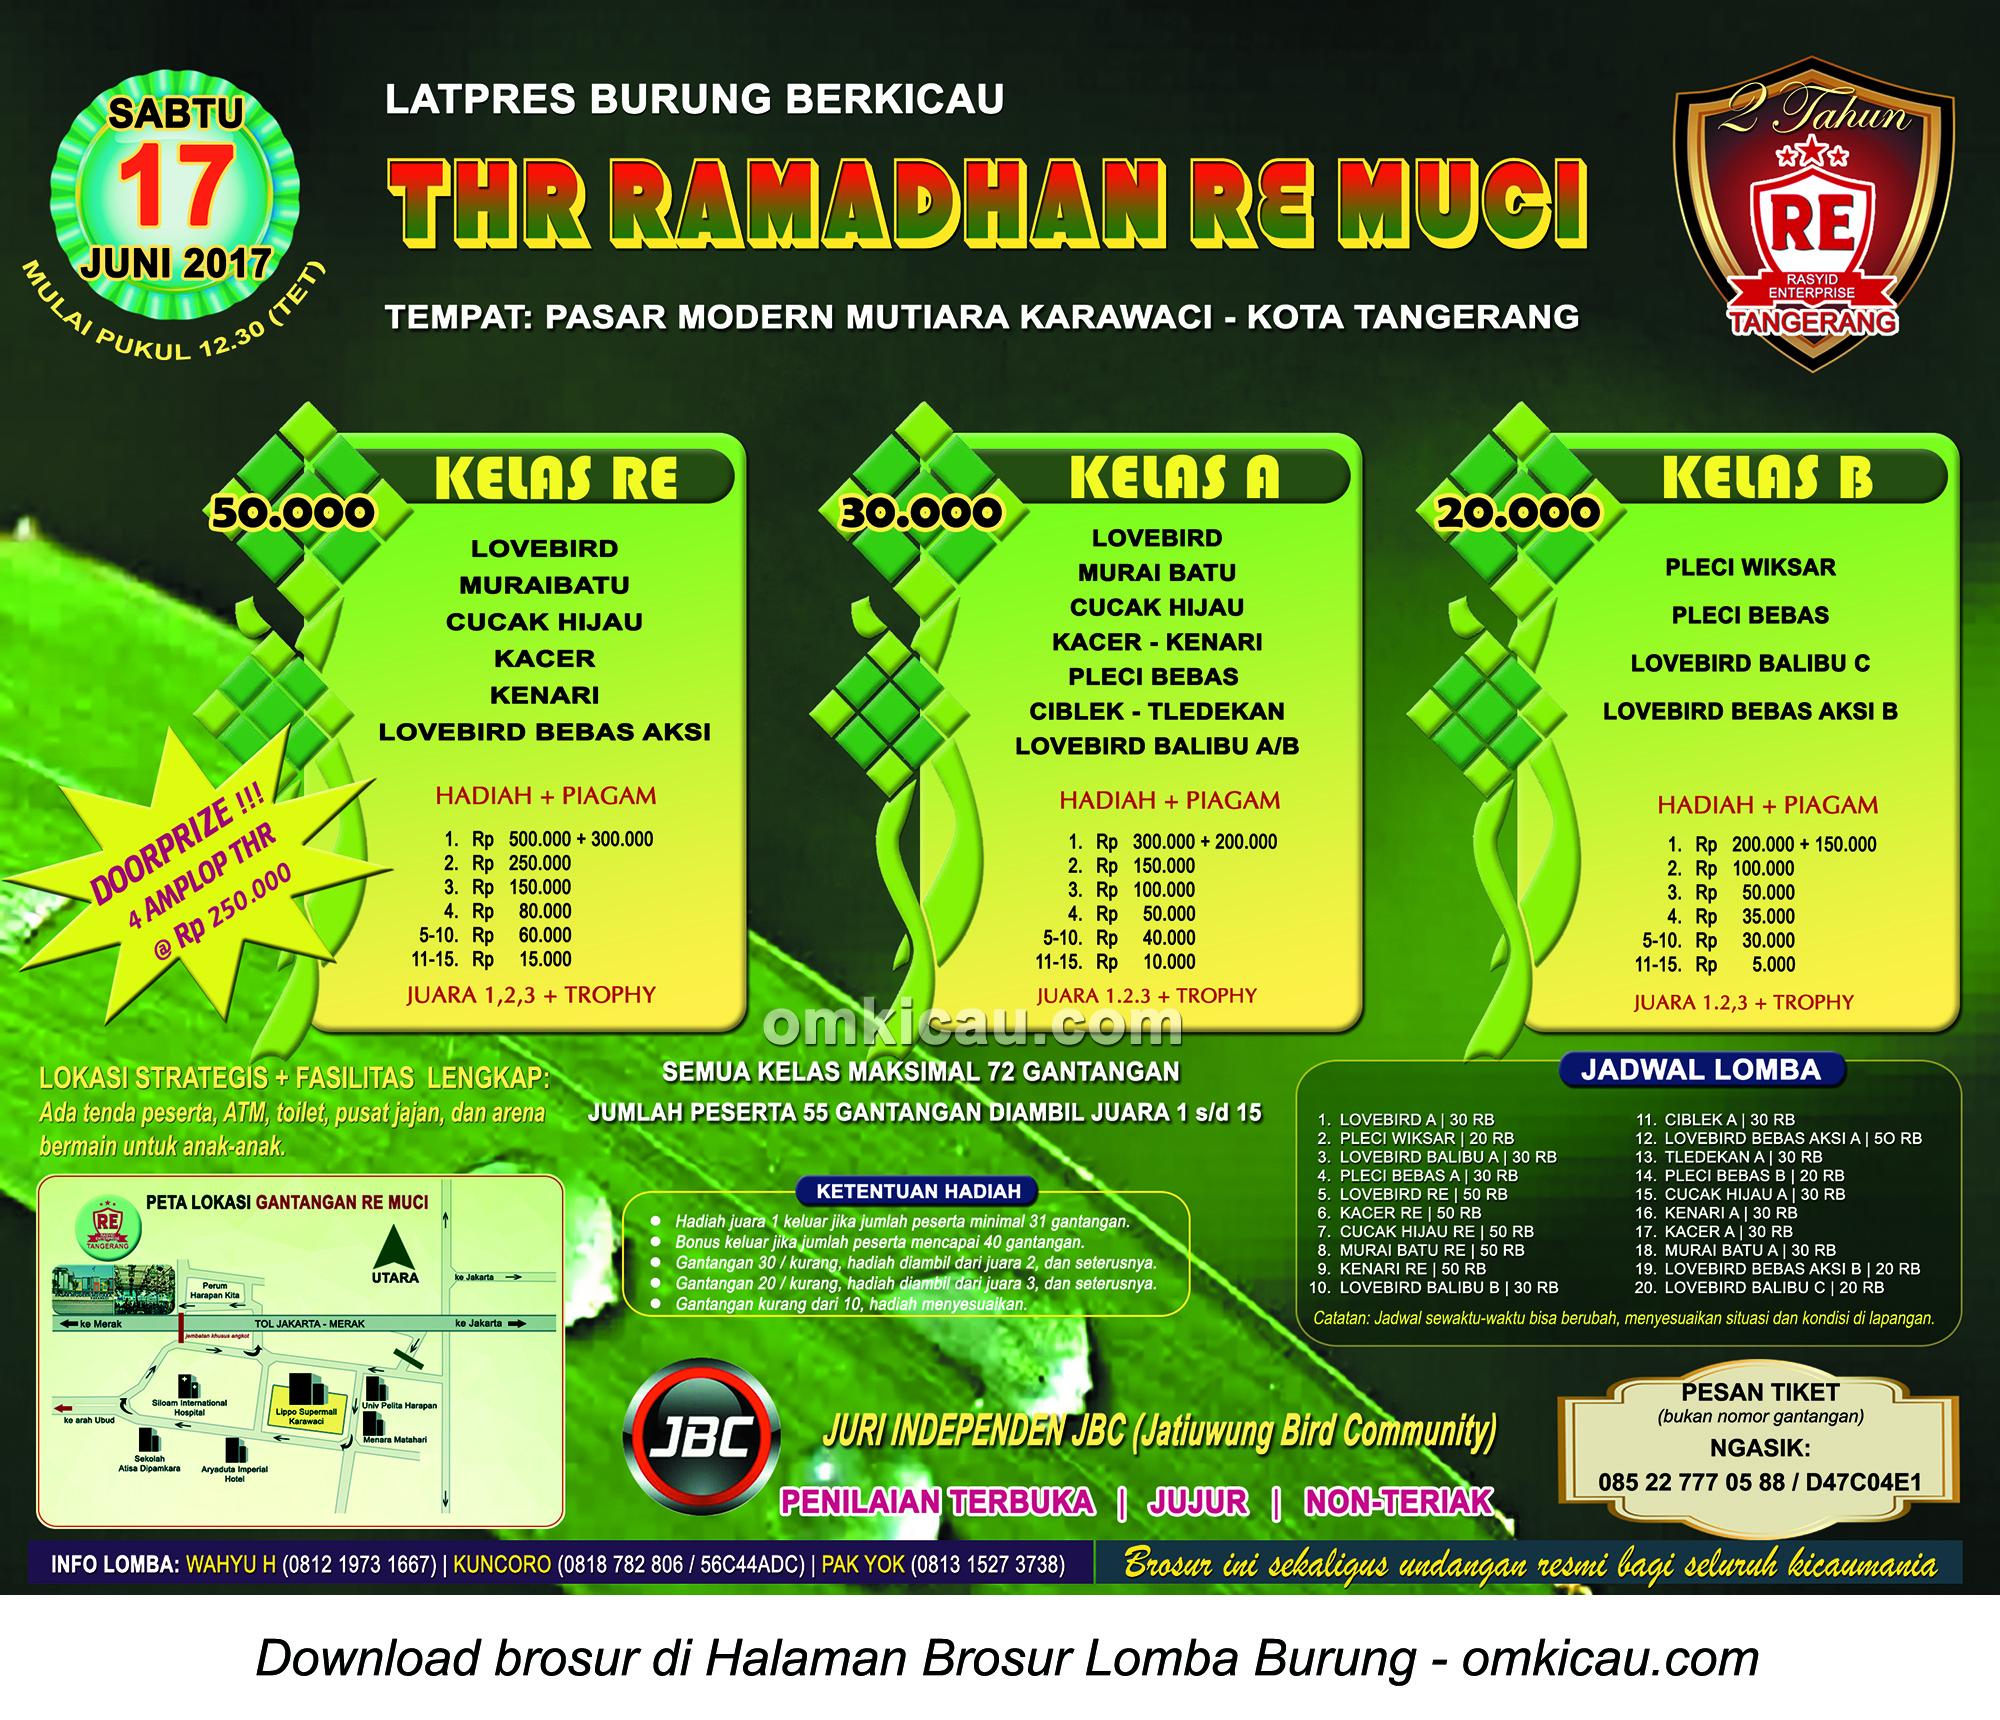 Brosur Latpres THR Ramadhan RE Muci, Tangerang, 17 Juni 2017